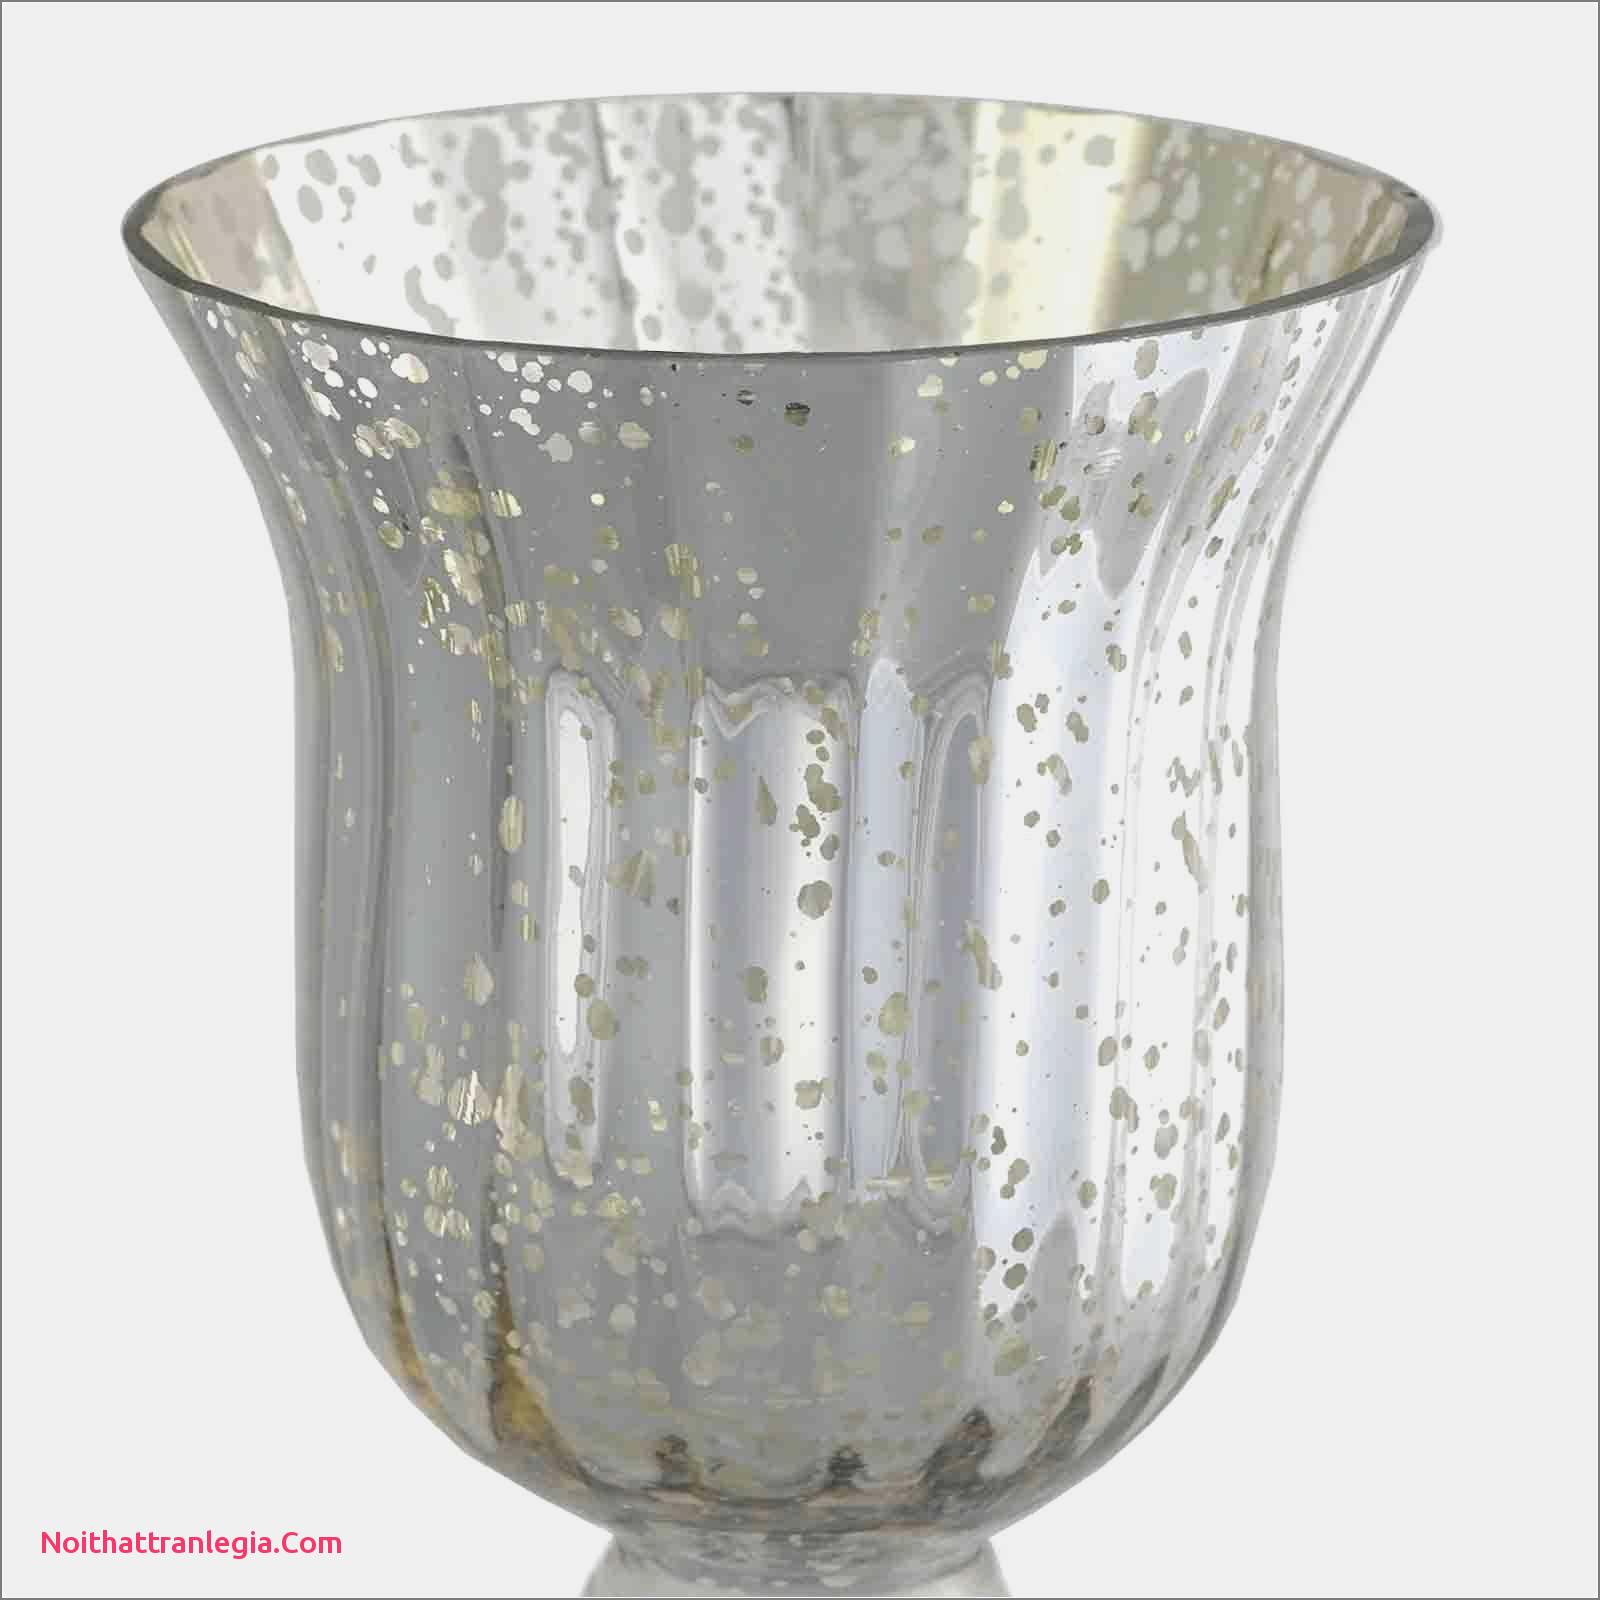 vintage green glass bud vase of 20 wedding vases noithattranlegia vases design throughout wedding guest gift ideas inspirational candles for wedding favors superb pe s5h vases candle vase i